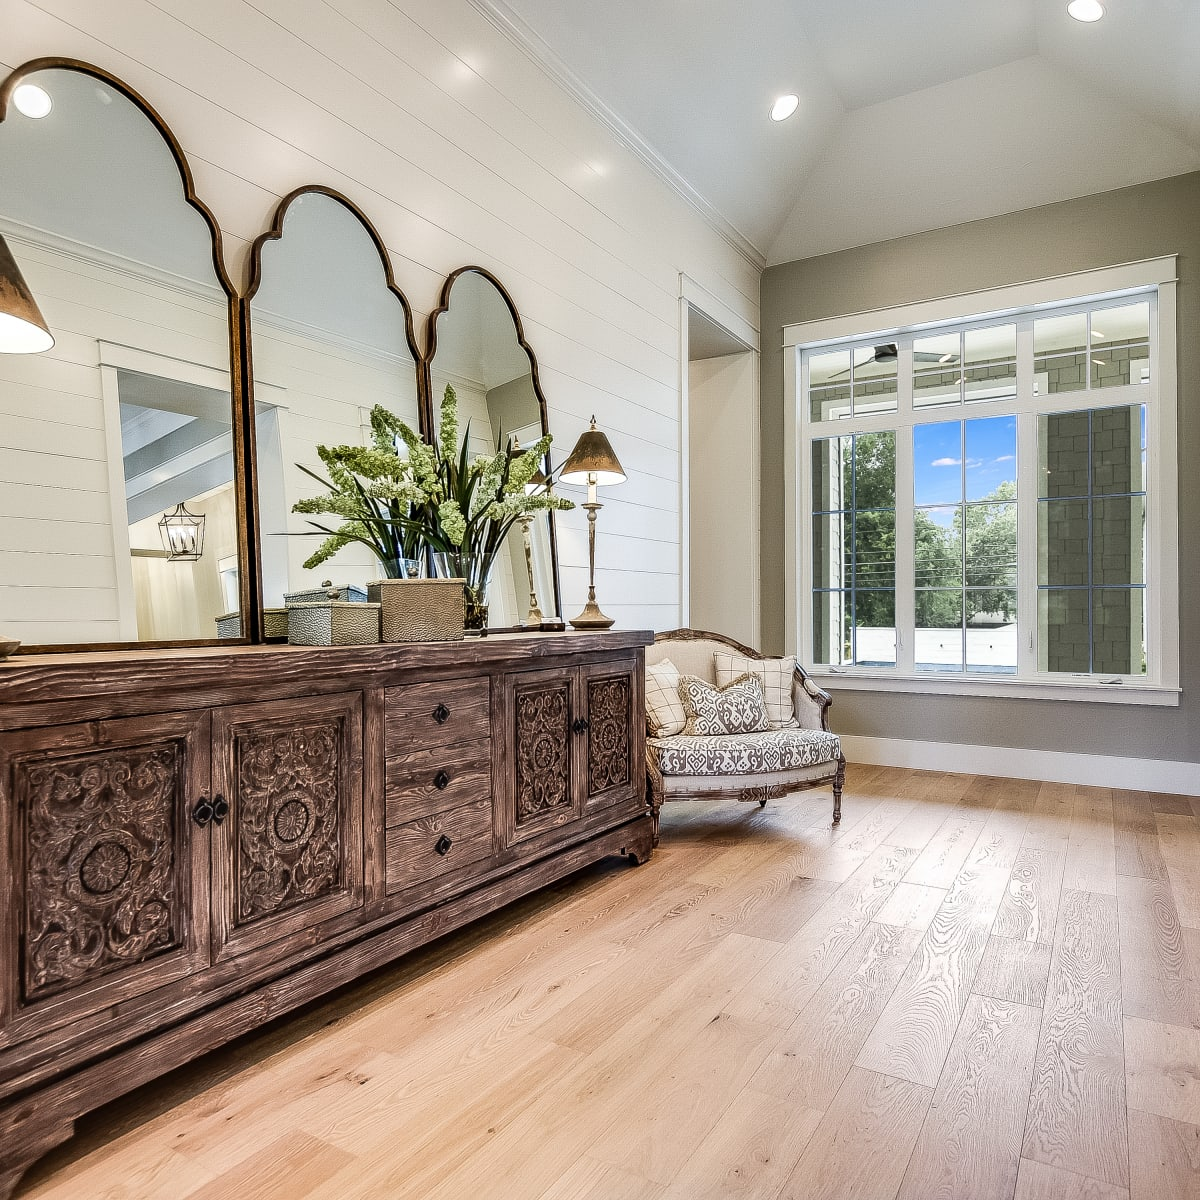 1016 Garraty, San Antonio, house, for sale, entry